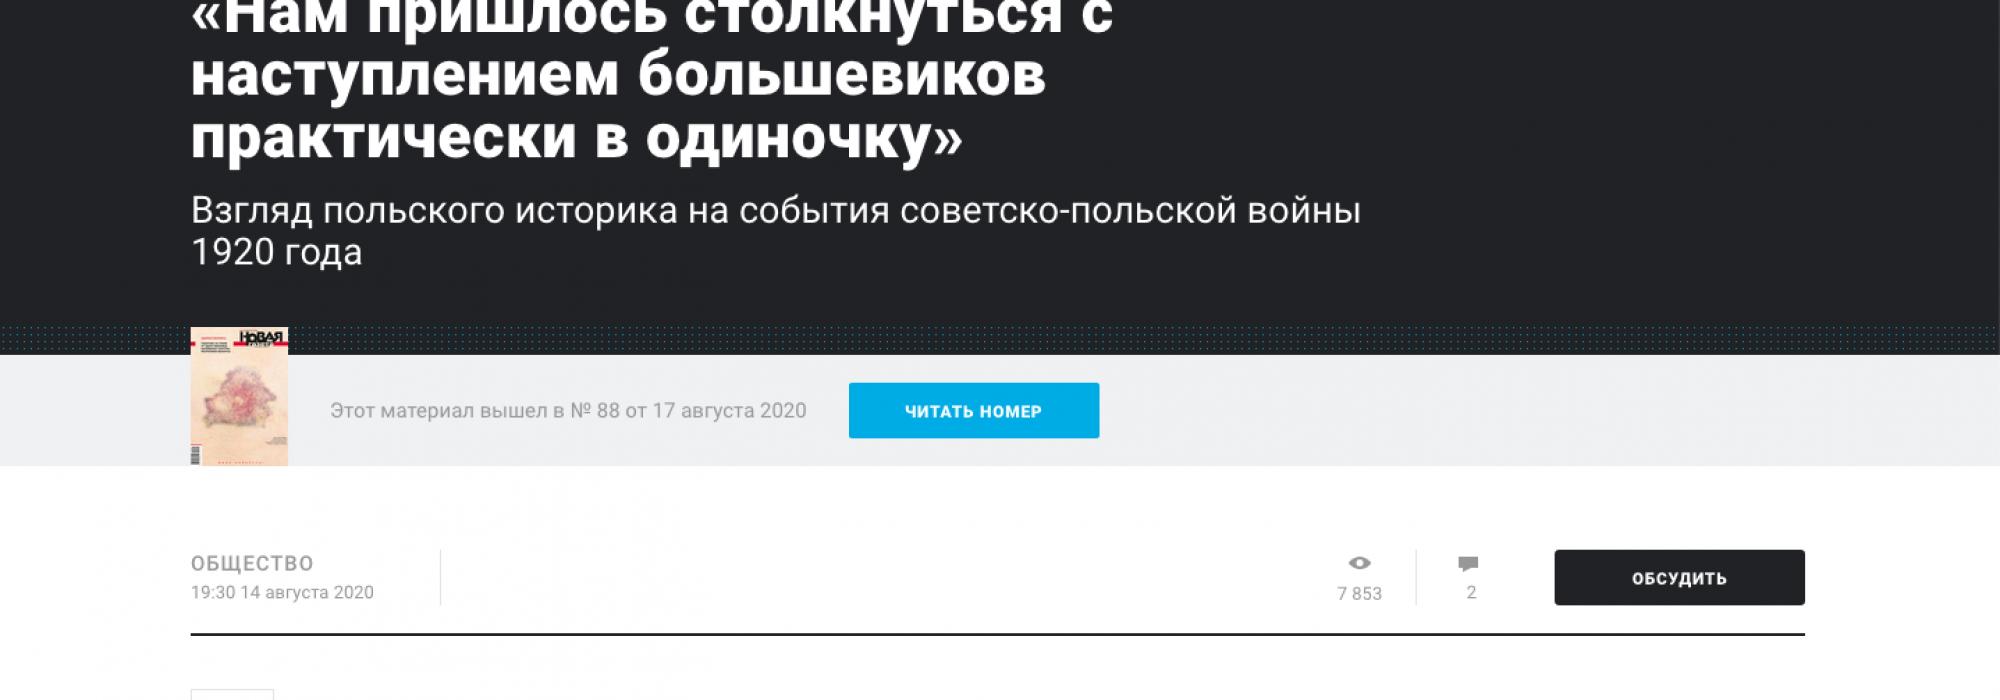 Zrzut ekranu 2020-08-17 o 10.51.16